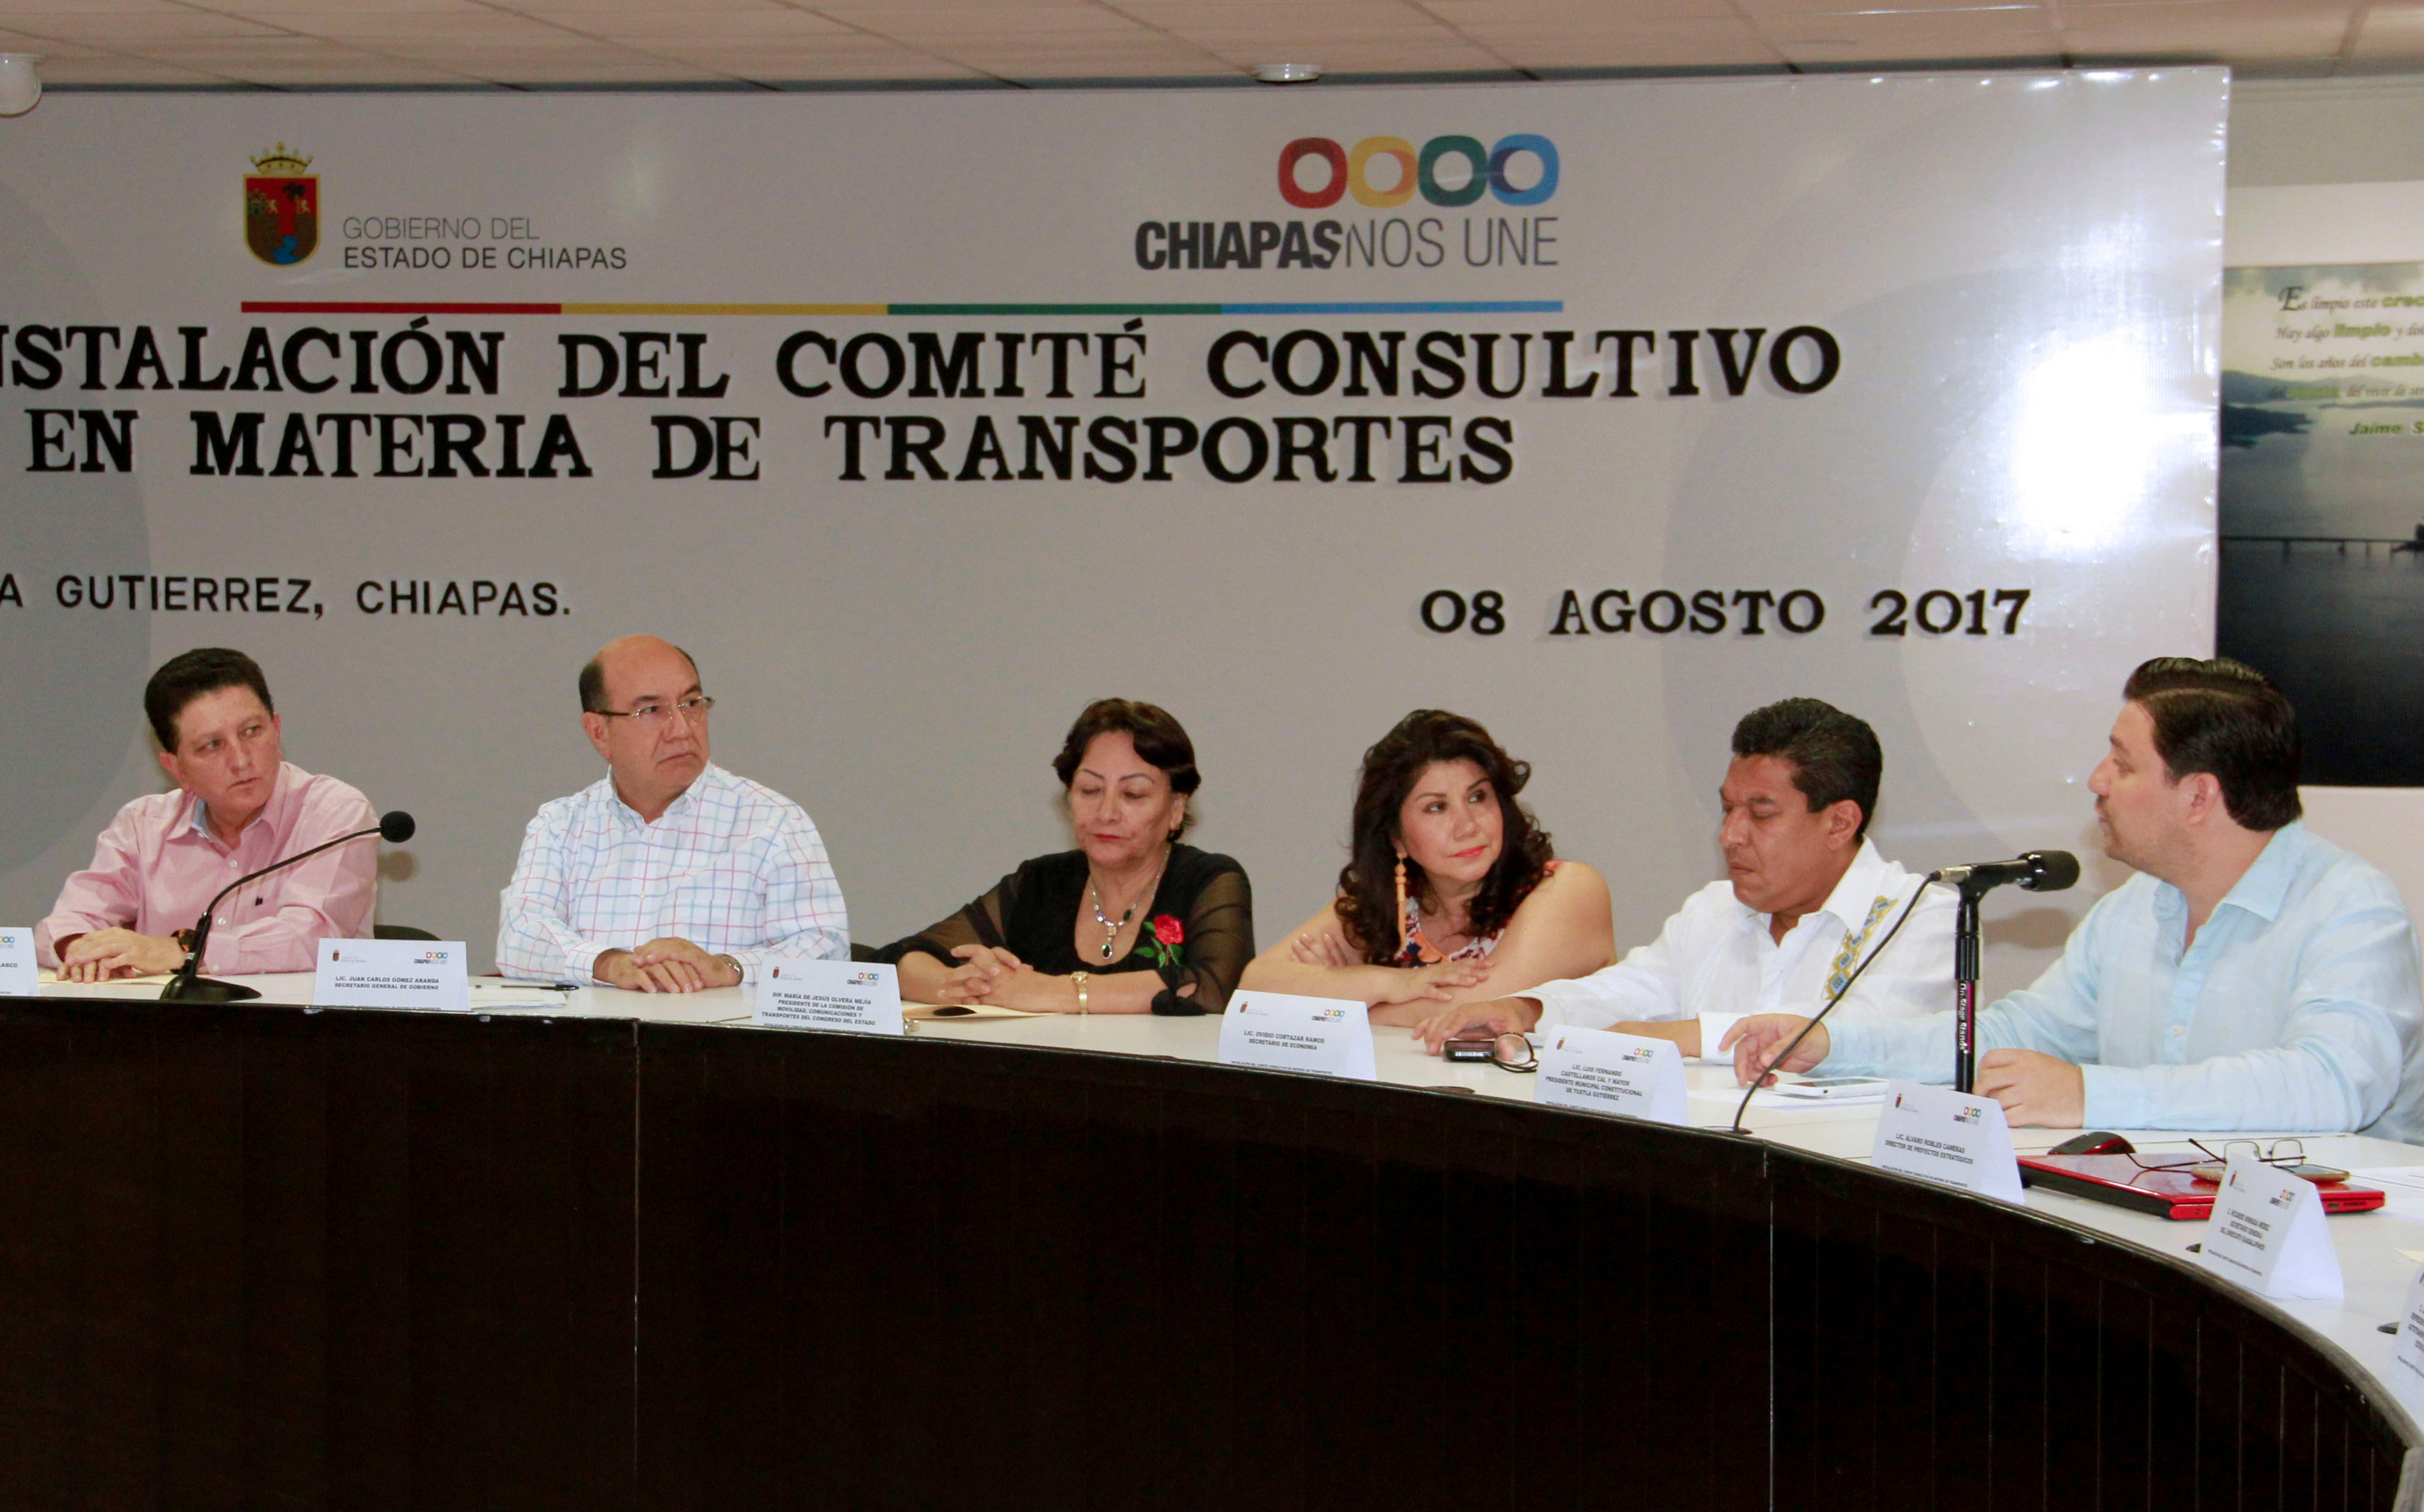 En marcha Comité Consultivo de Transporte en Chiapas